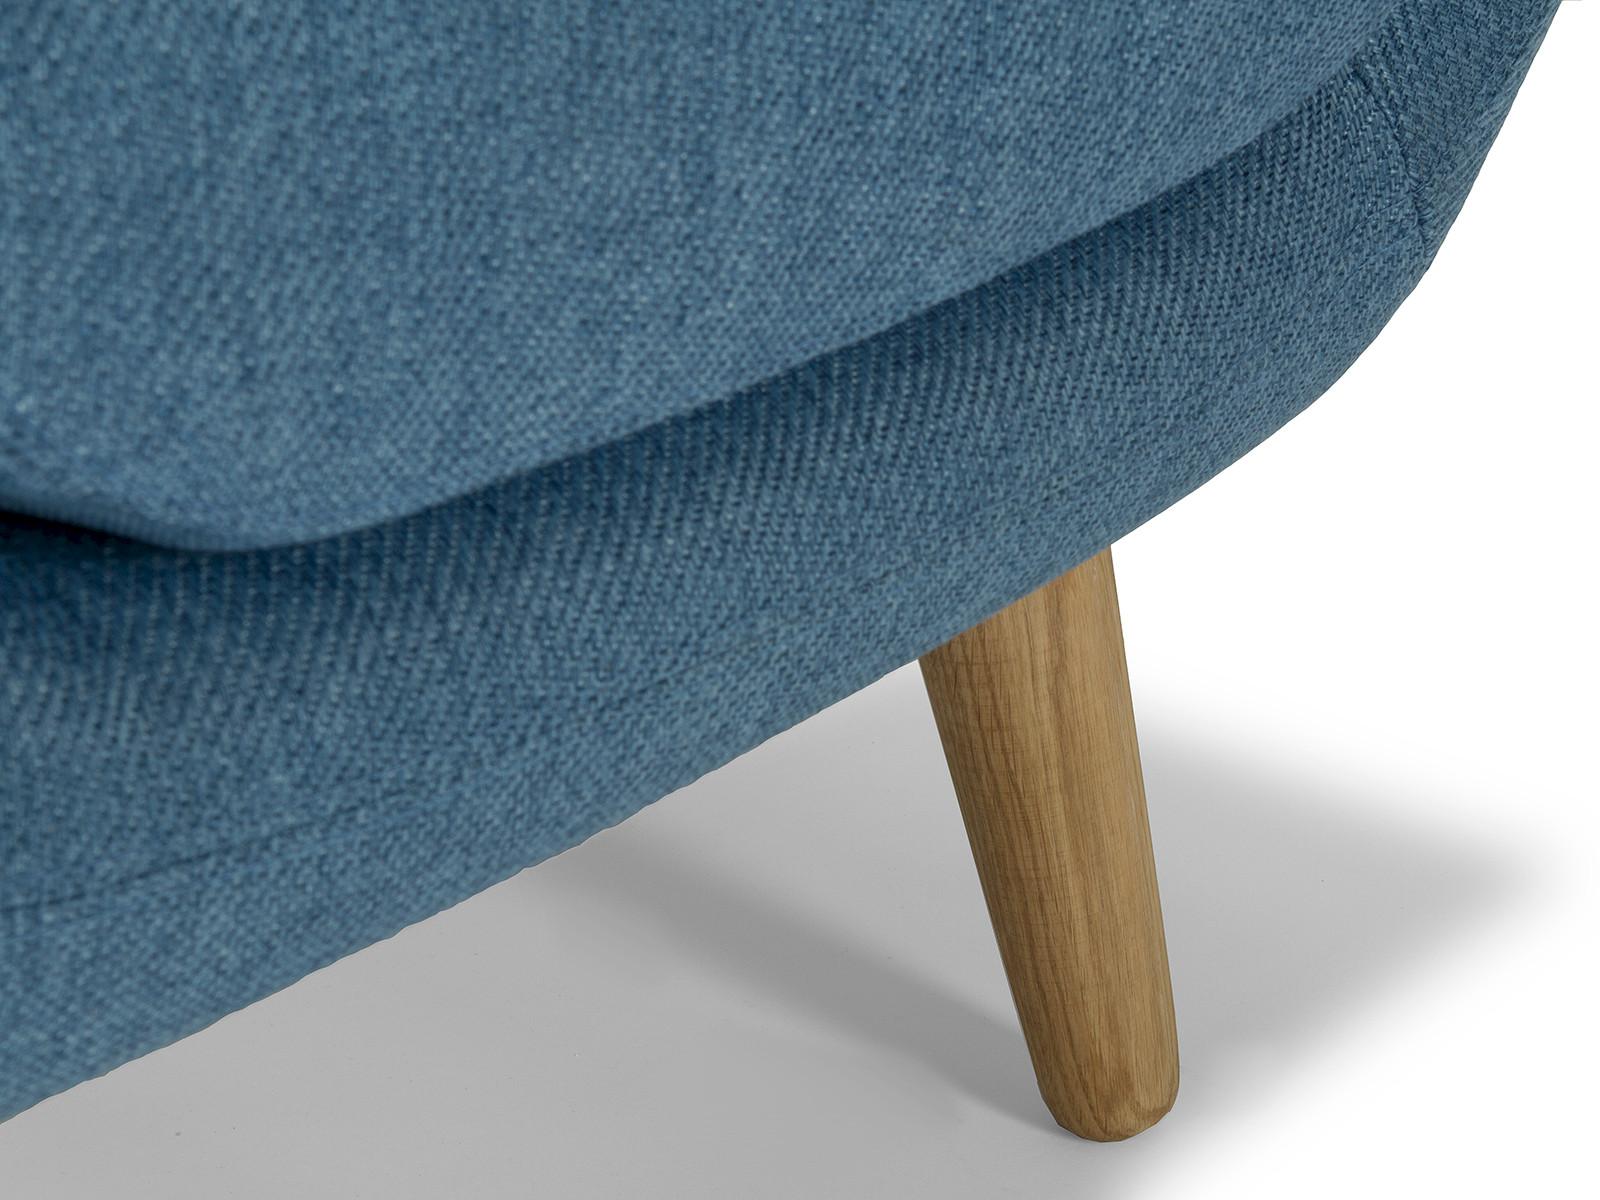 60er Jahre Vintage Sessel Retro 2 Sitzer